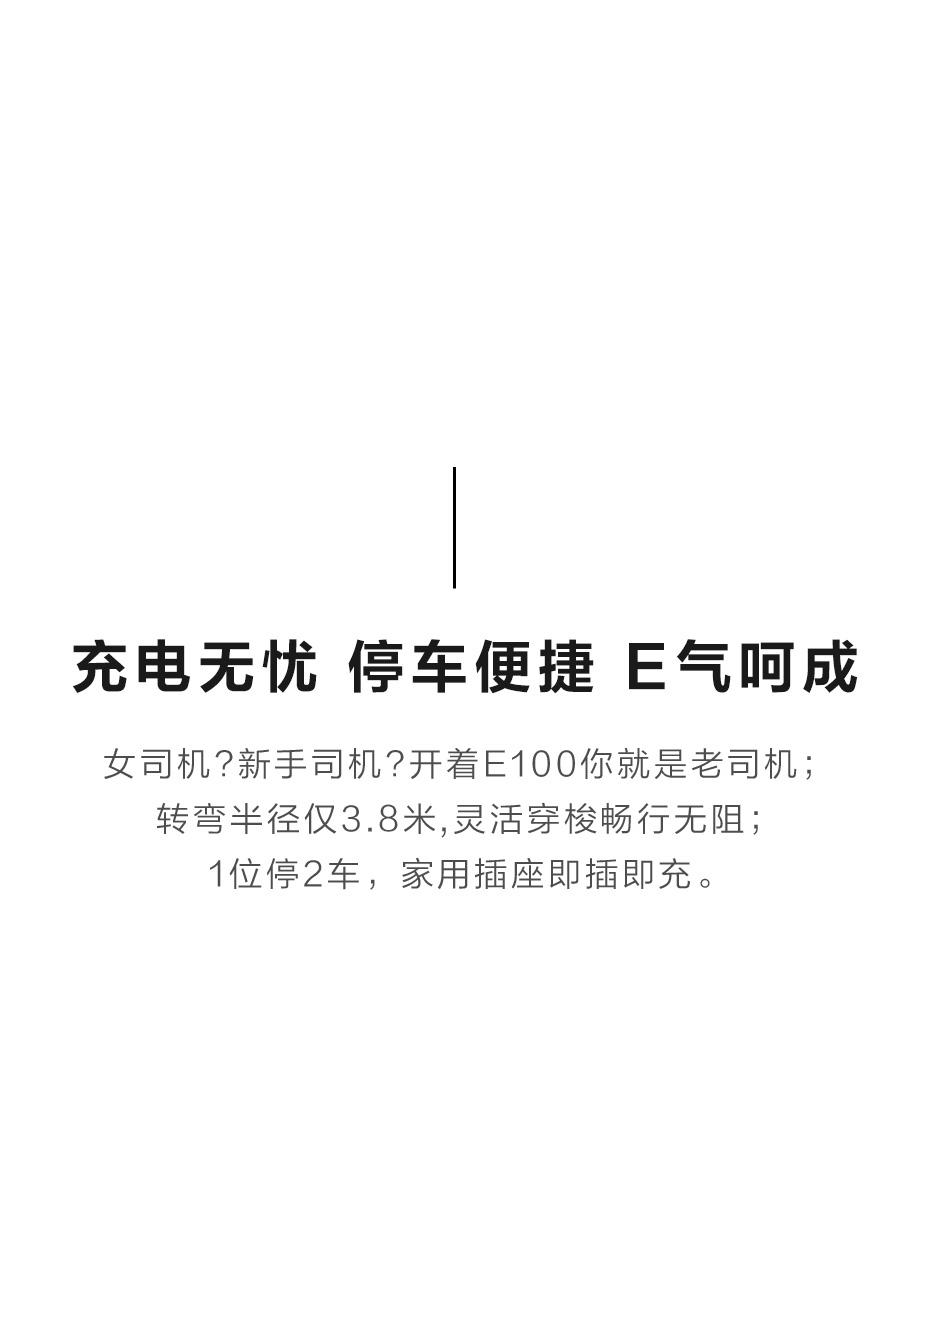 寶(bao)駿E100,電動(dong)汽(qi)車,新能源(yuan)車,車身,充電,配置參數